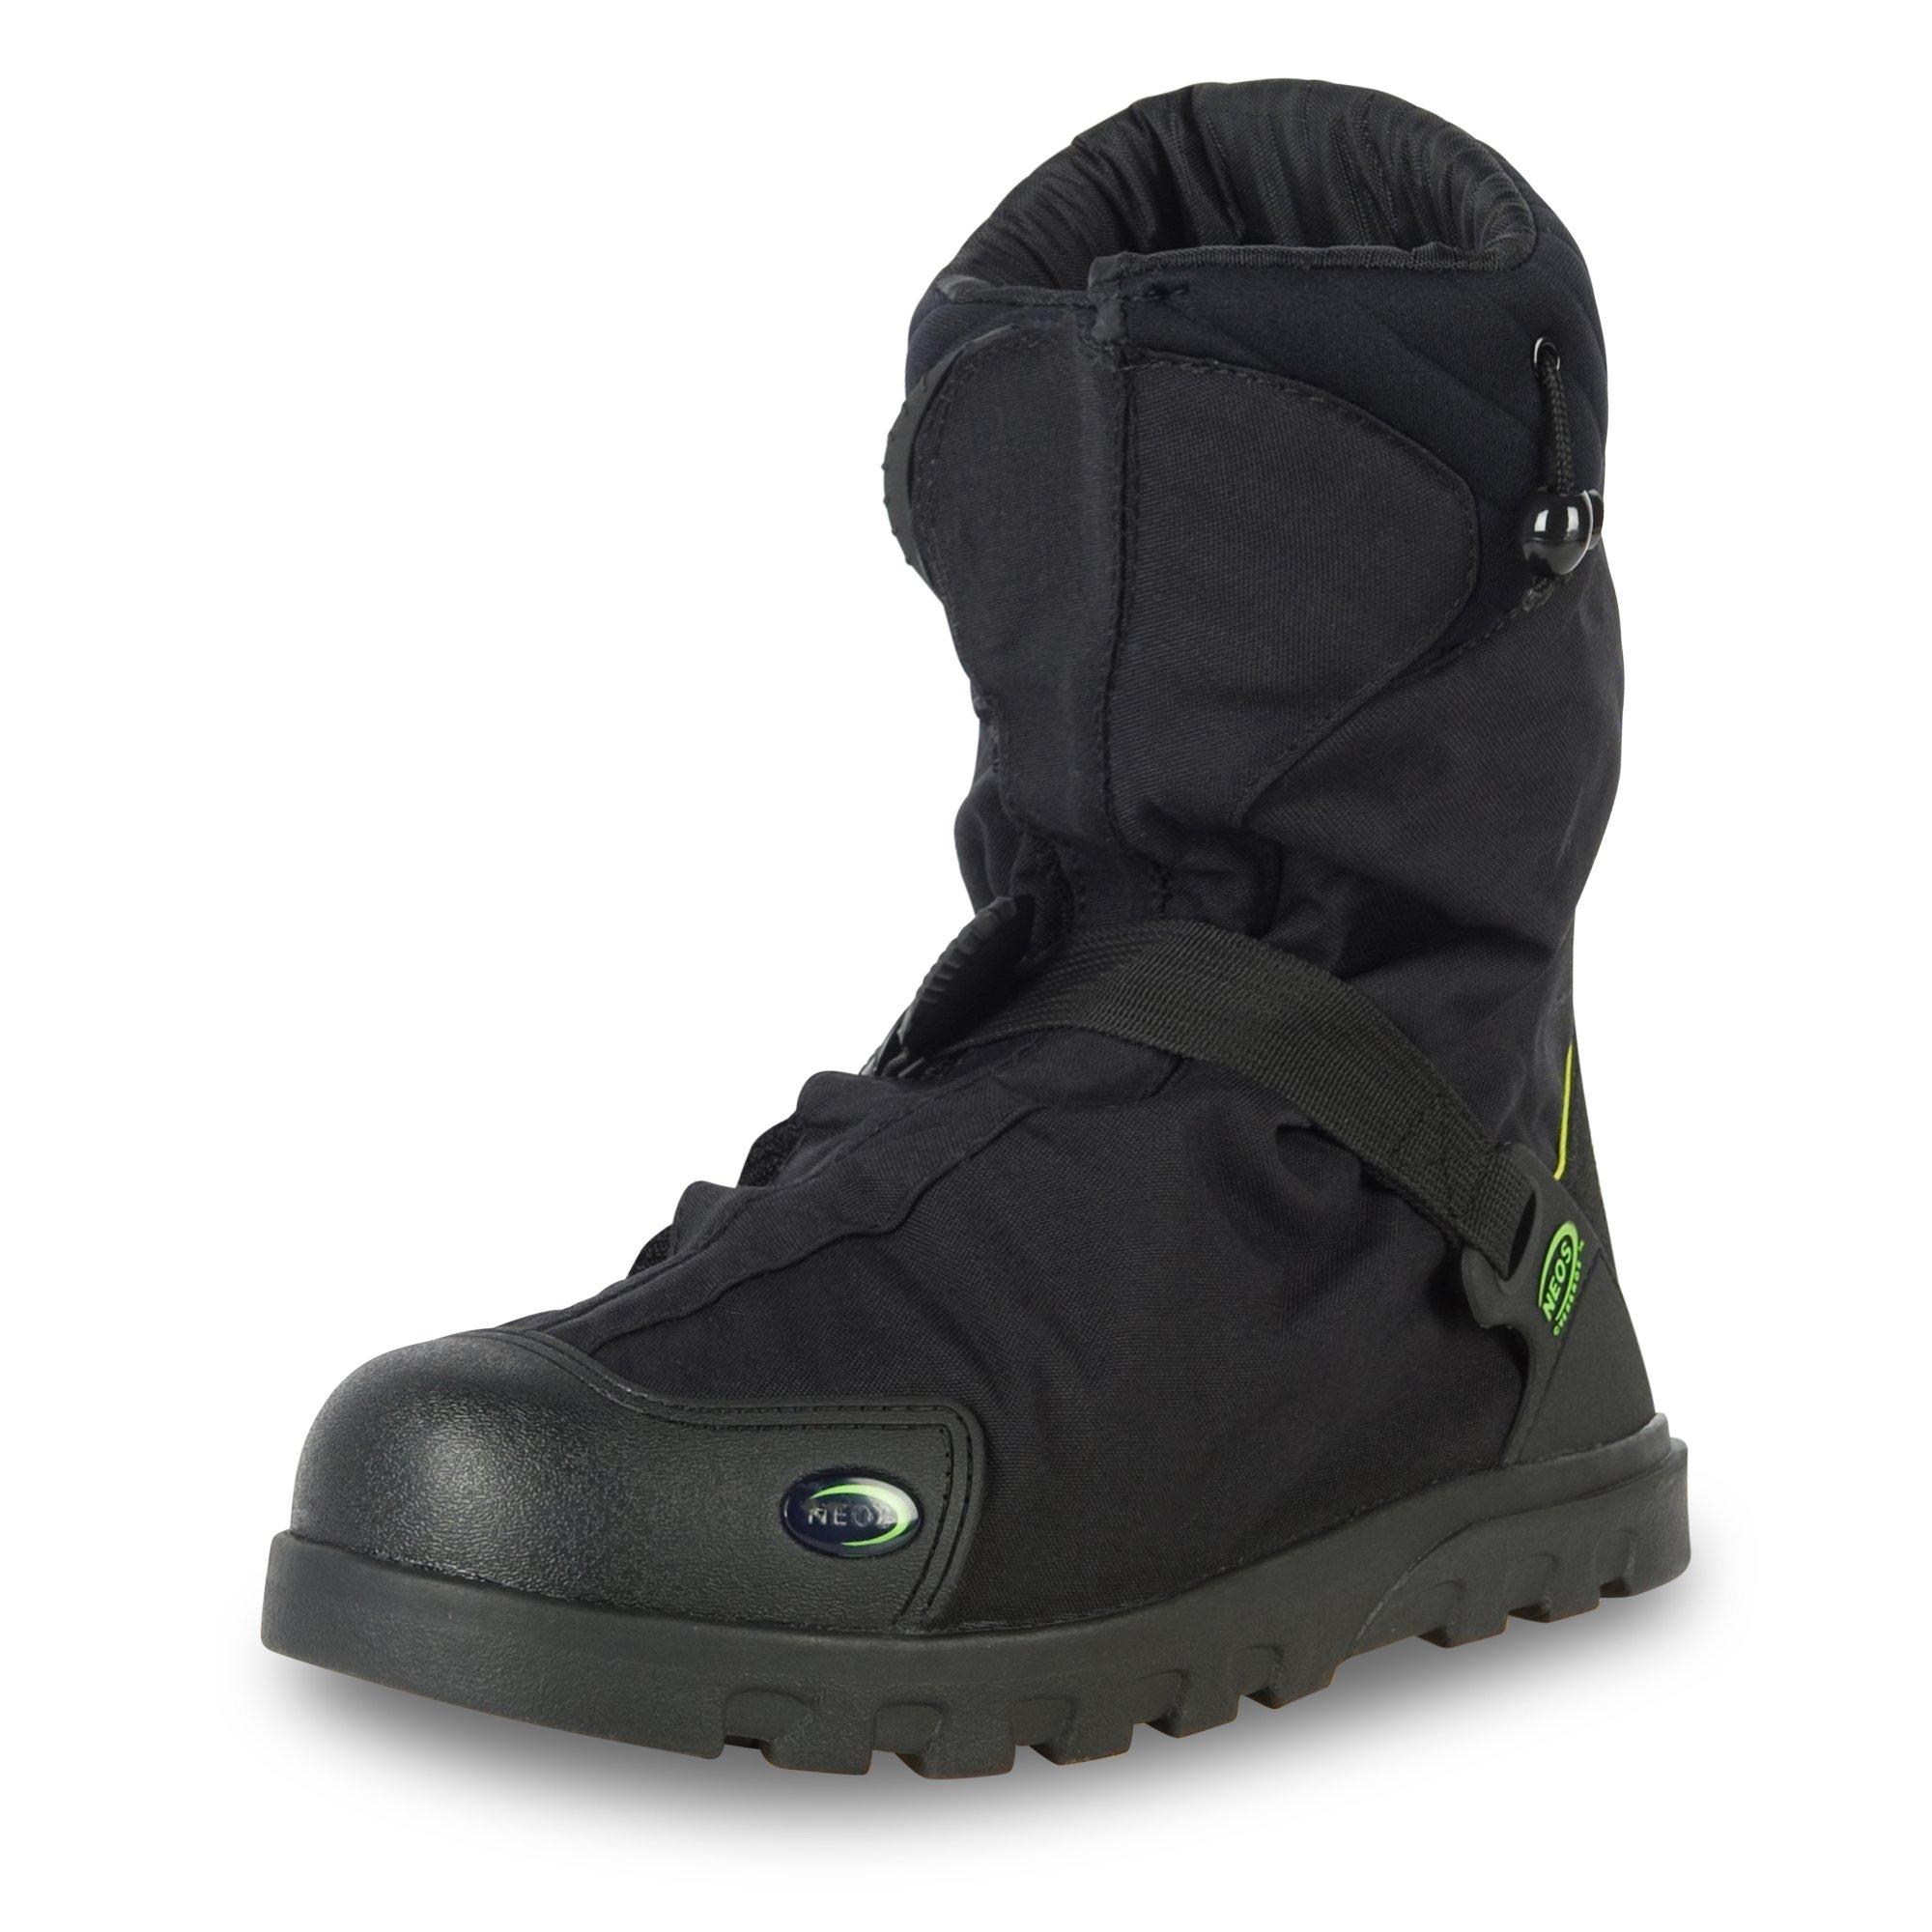 NEOS 11'' Explorer Waterproof Winter Overshoes (EXPG)